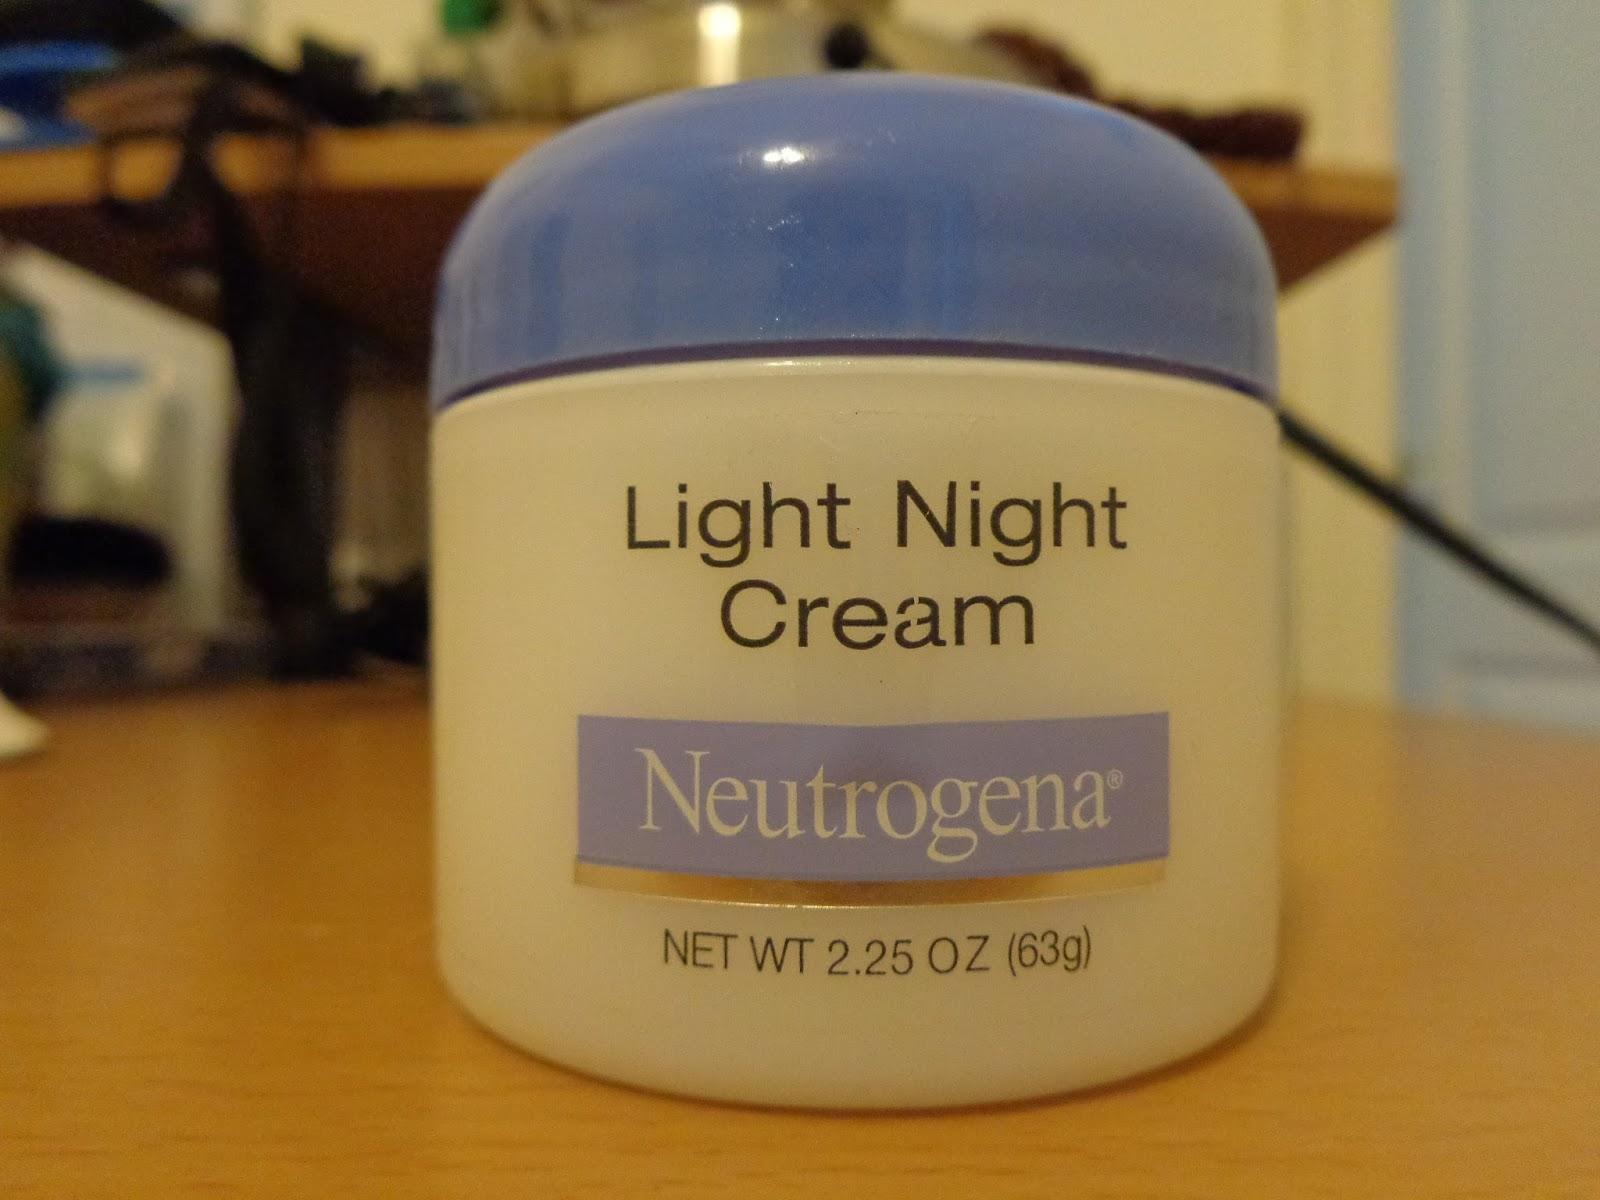 neutrogena light night cream. Black Bedroom Furniture Sets. Home Design Ideas